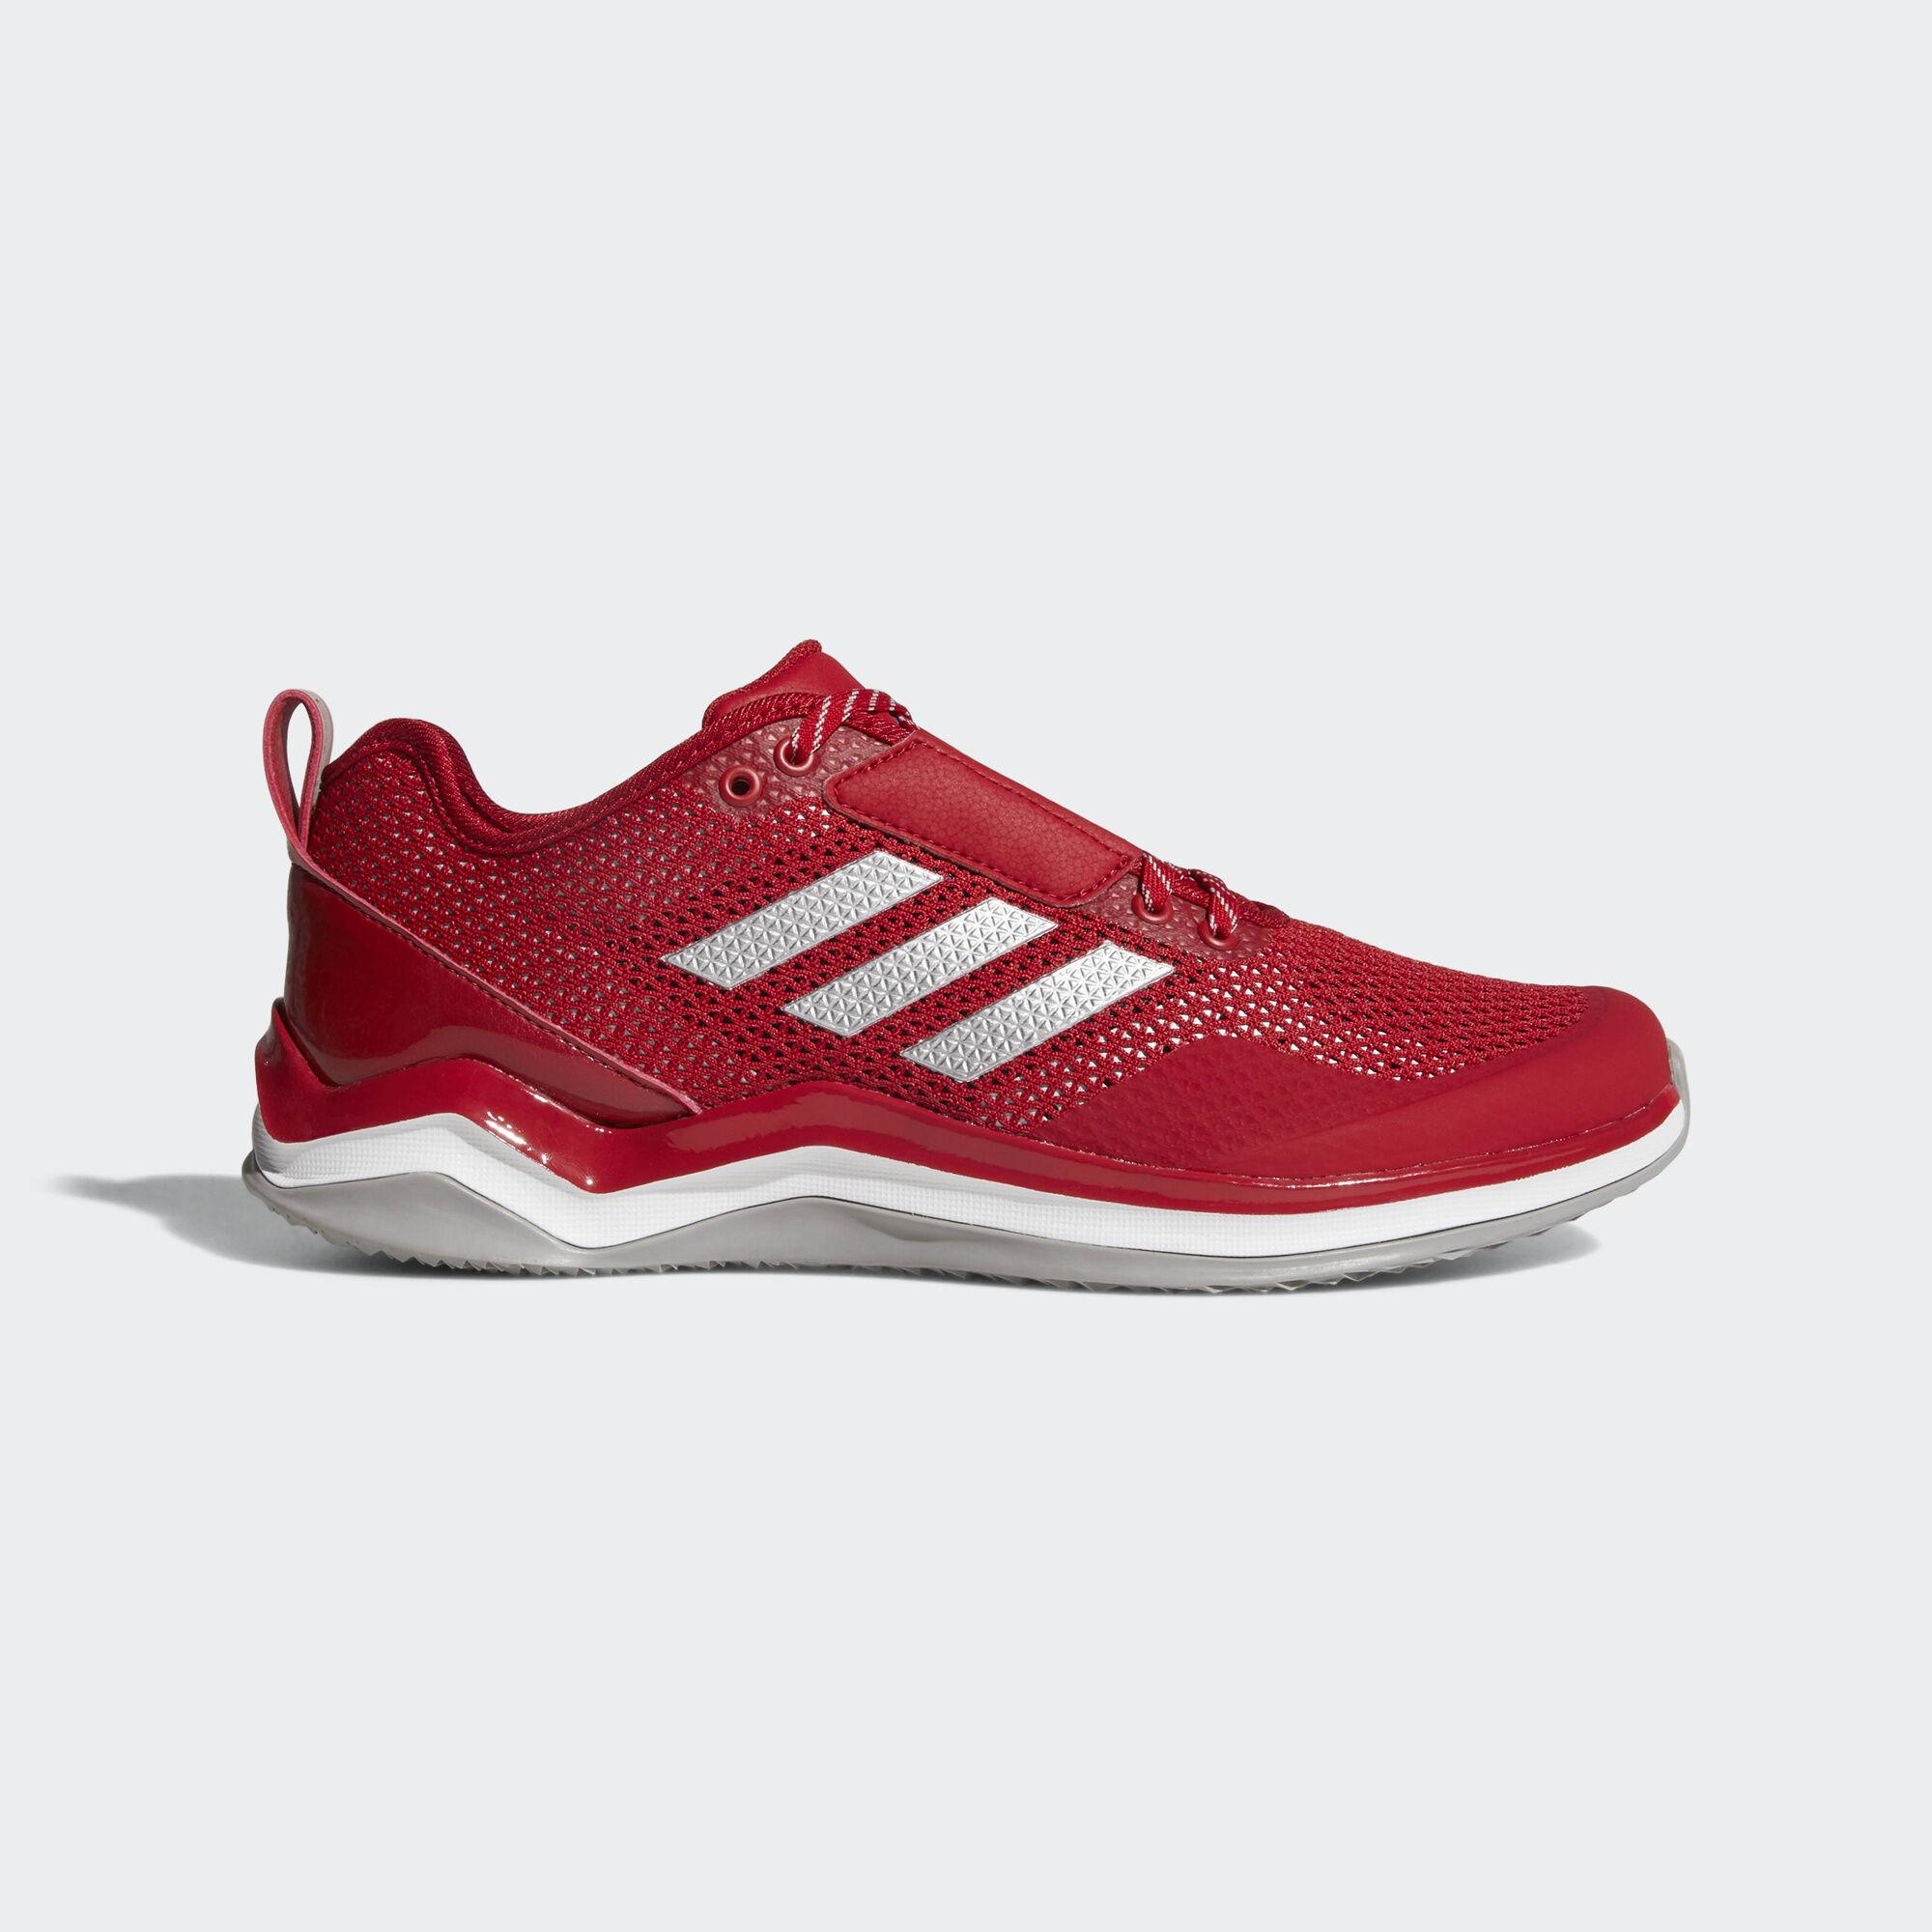 Adidas Shoes Red White softwaretutor.co.uk